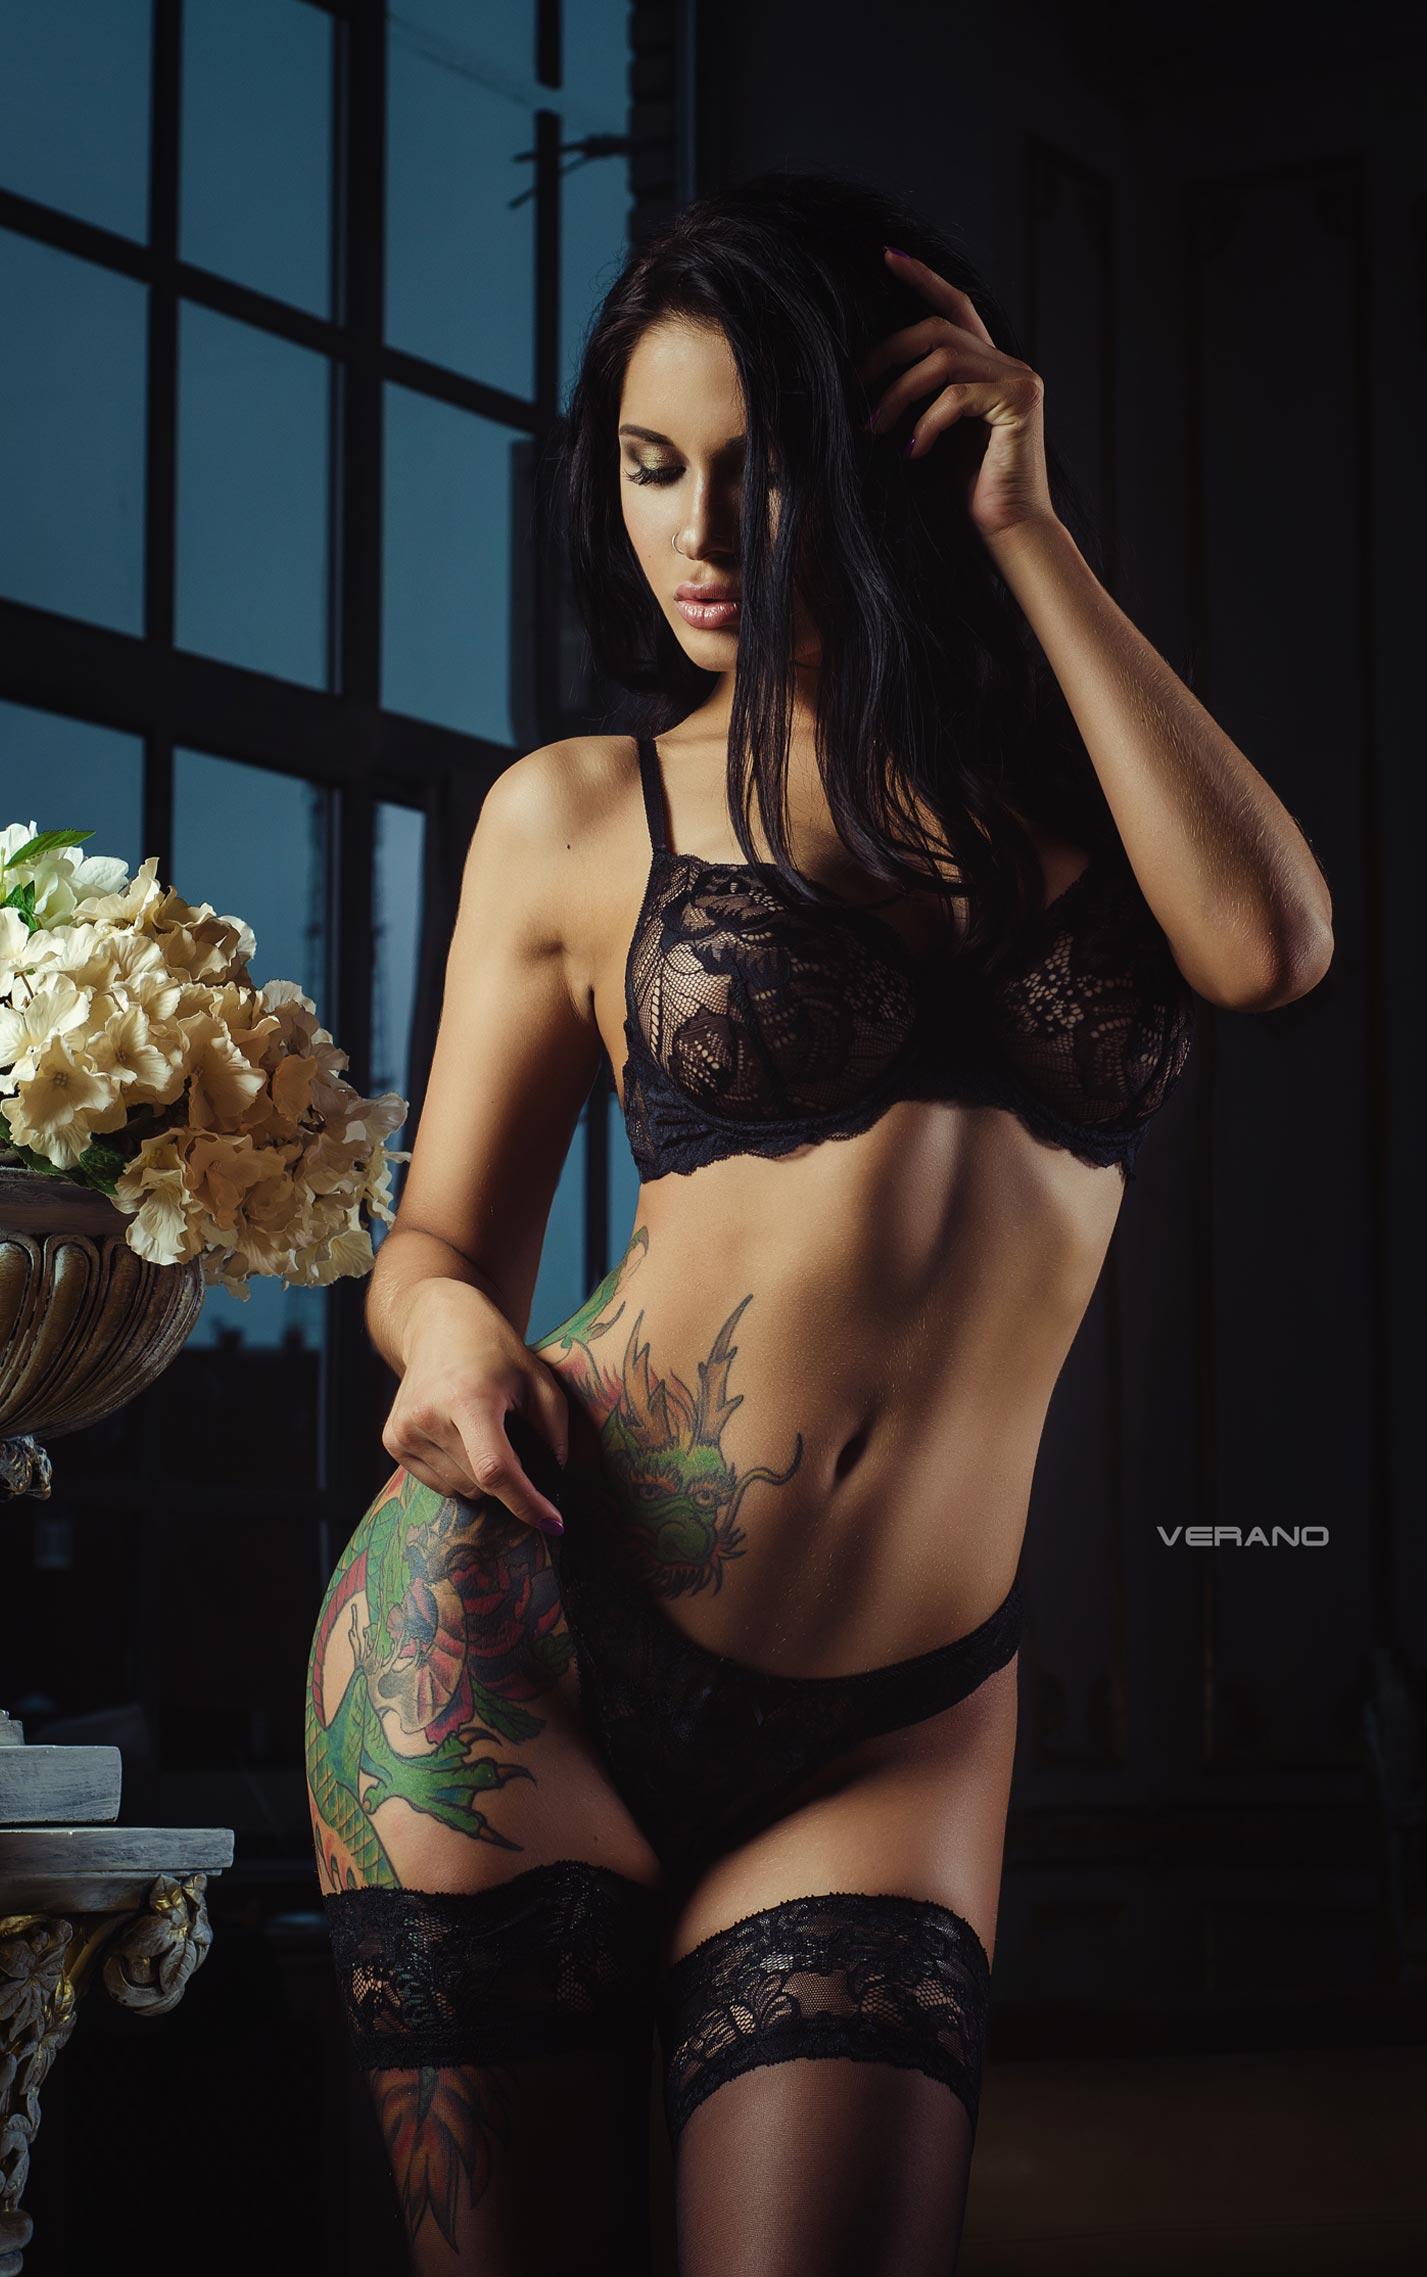 Lina Melton - Nikolas Verano photoshoot